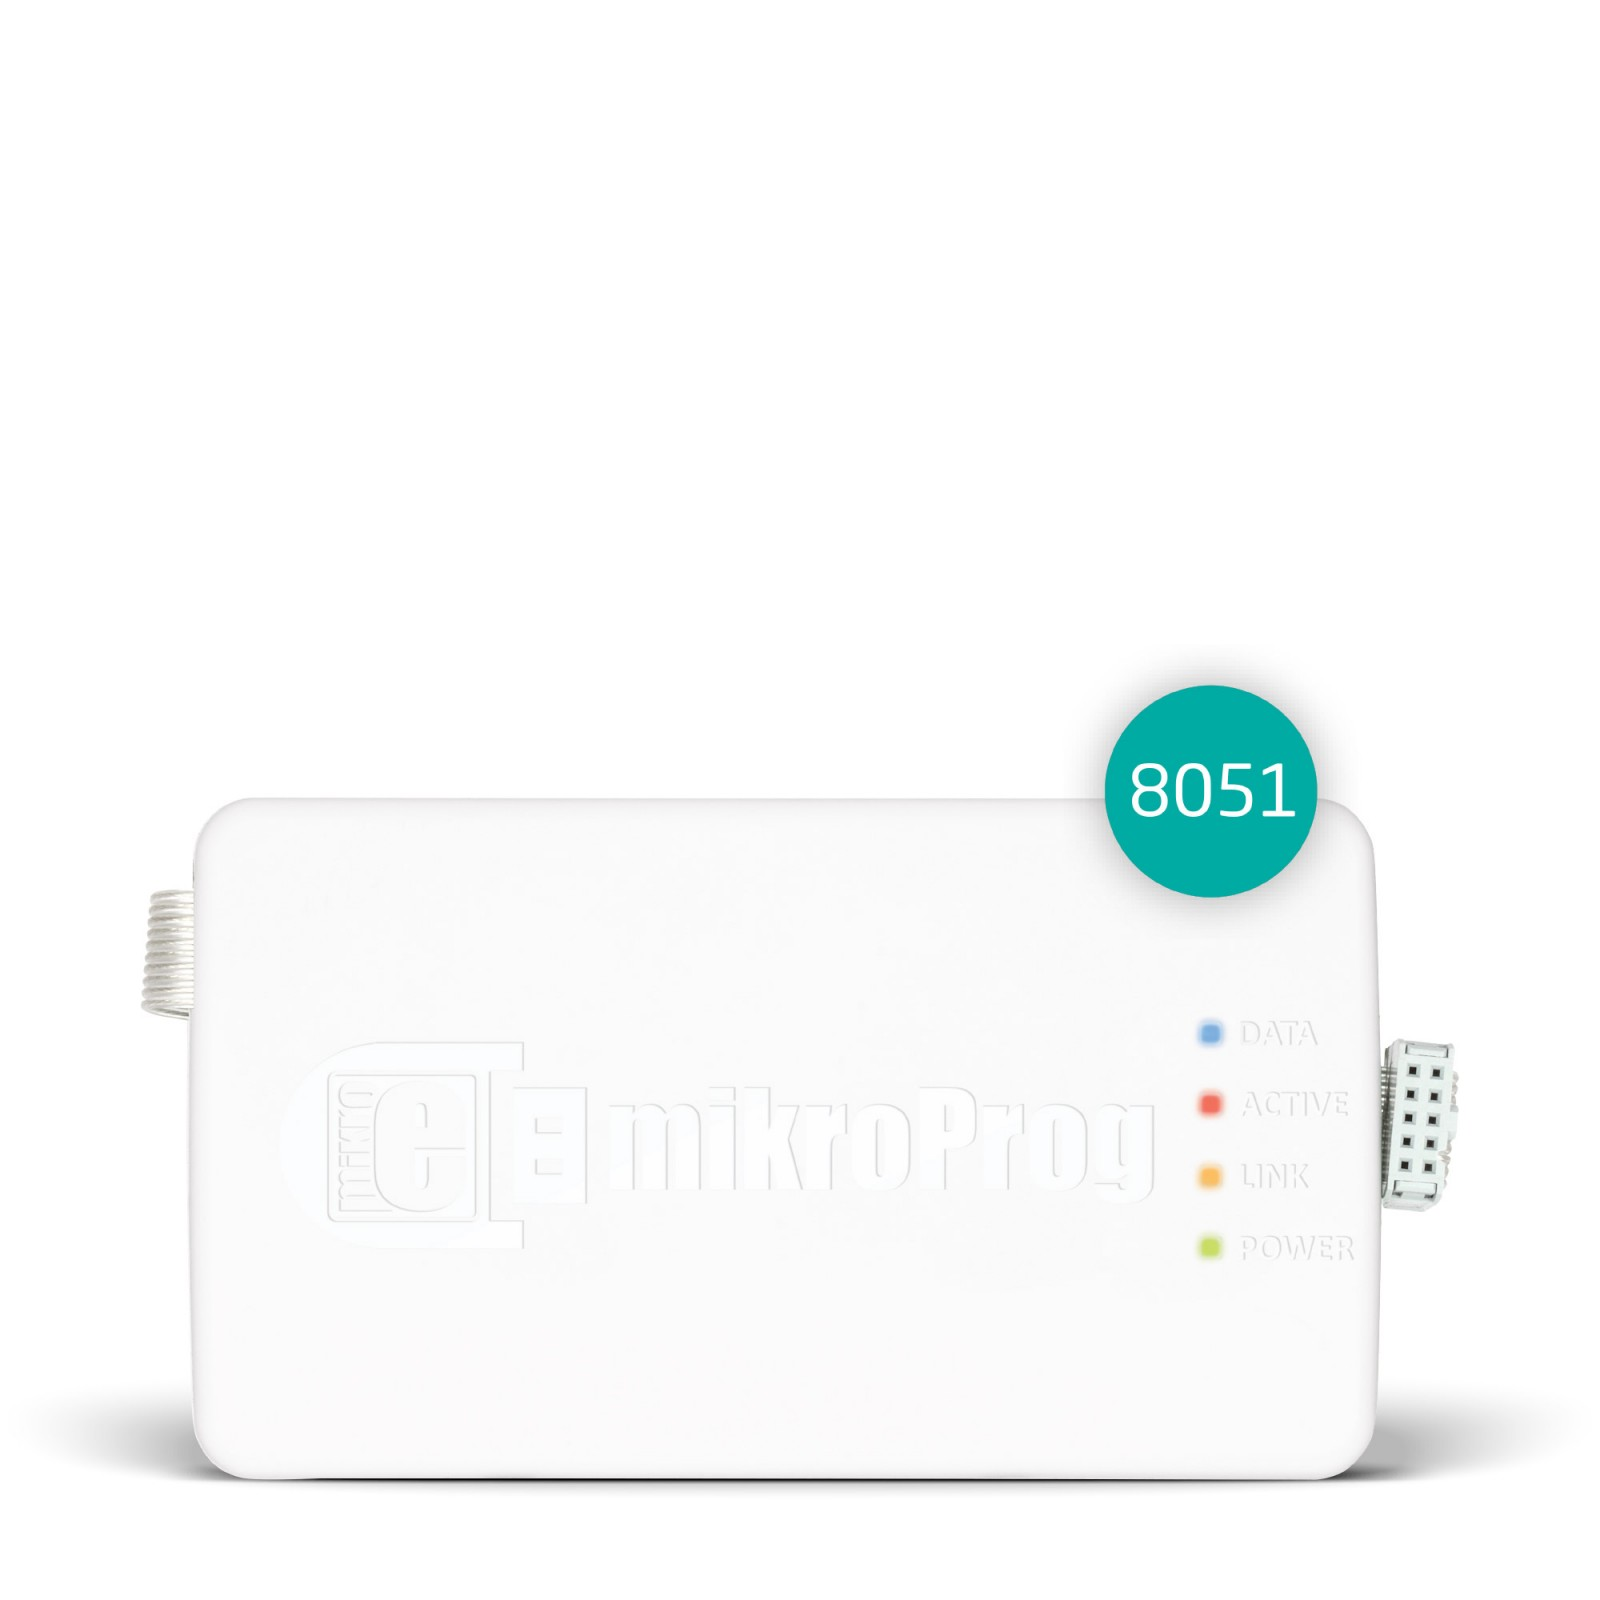 Mikroprog For 8051 Atmel At89 Microcontroller Programmer Basic Integer Calculator At89c51 Mgctlbxnmzp Mgctlbxv5112 Mgctlbxlc Mgctlbxpprestashop